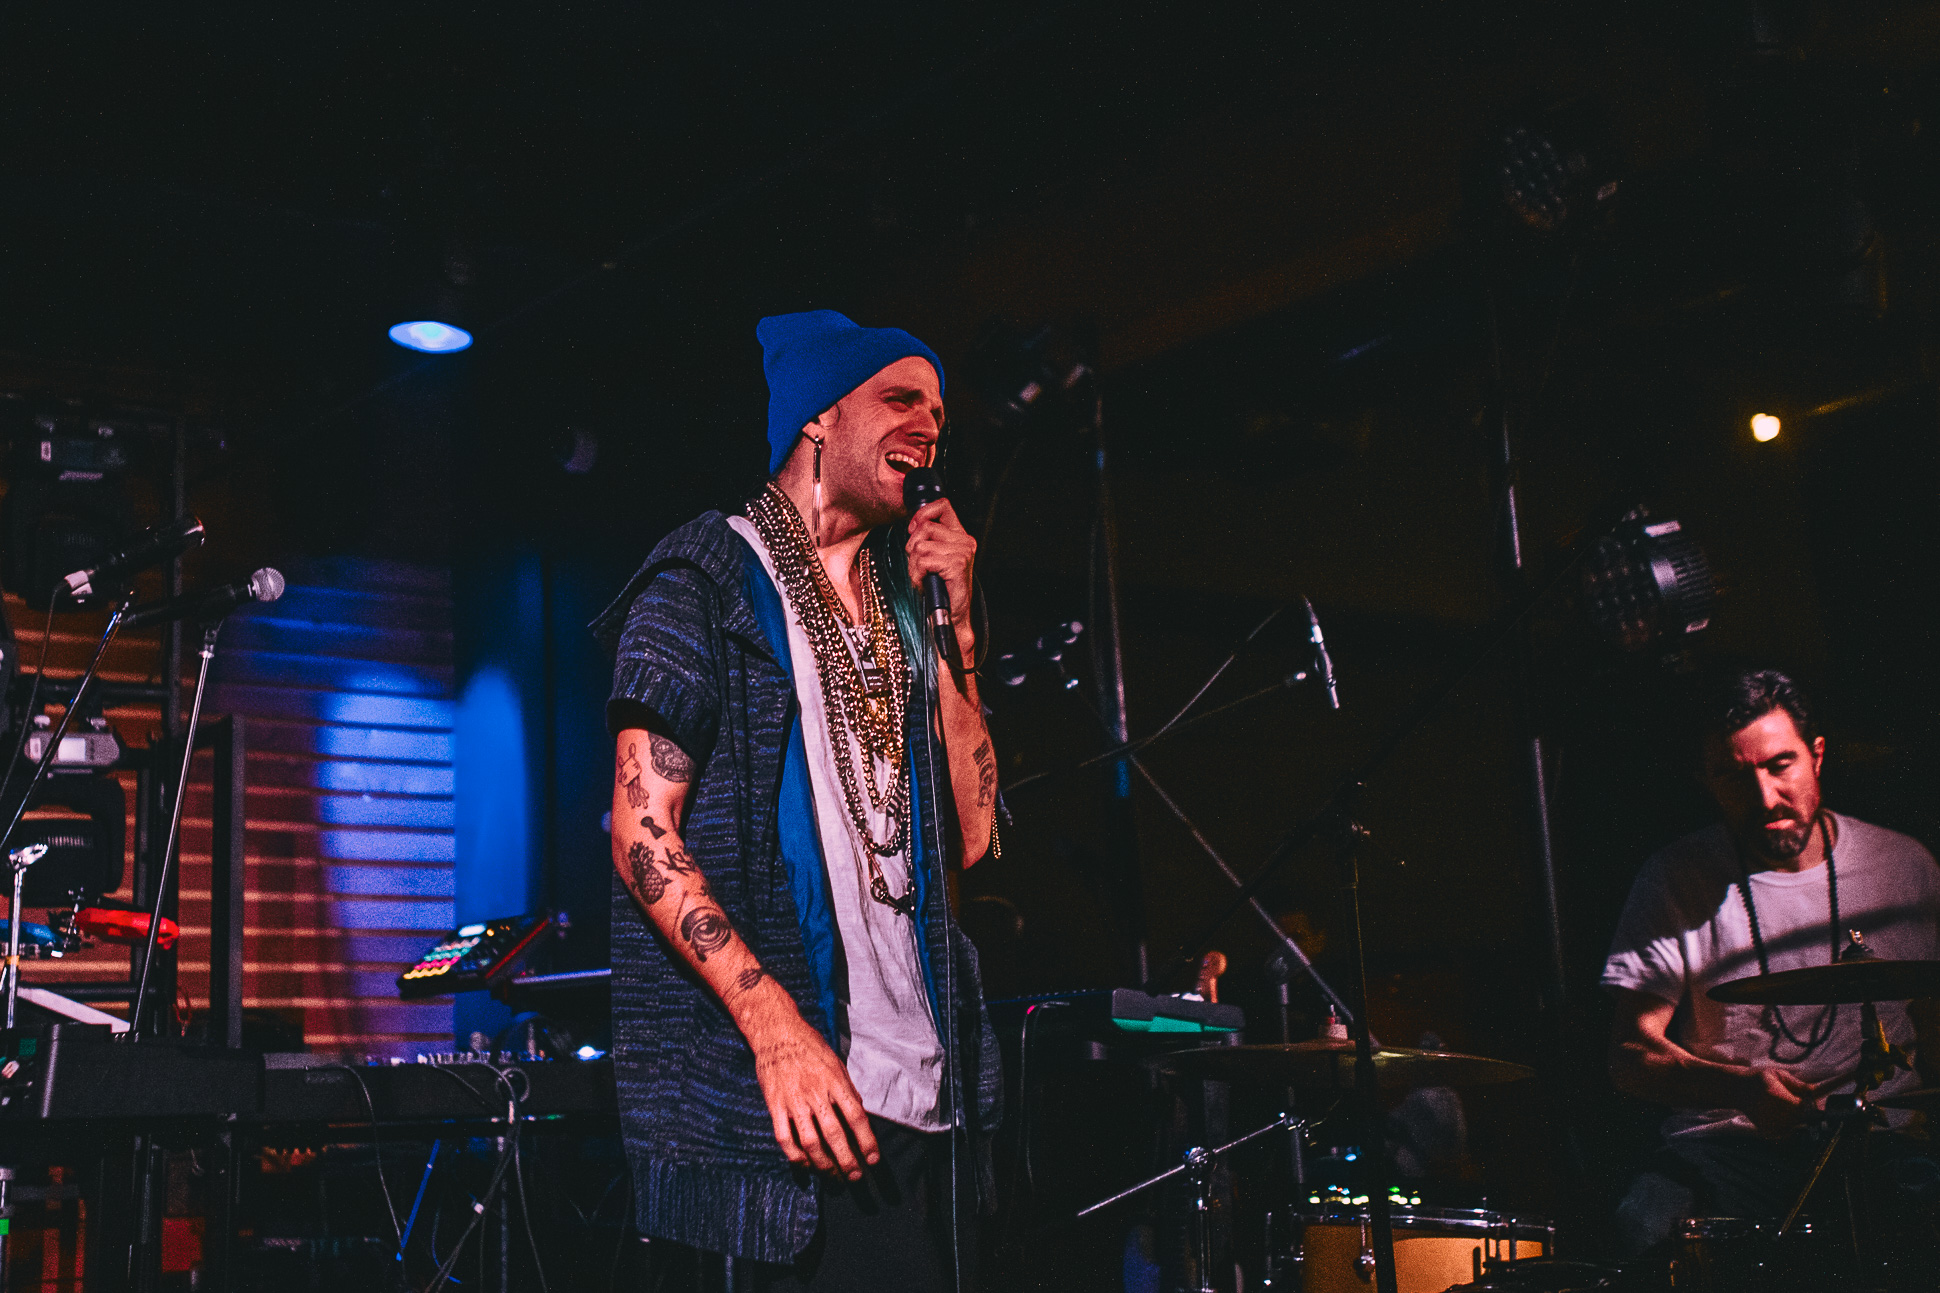 YoungAndSick-FortuneSoundClub-24-01-2019-Vancouver-03.jpg